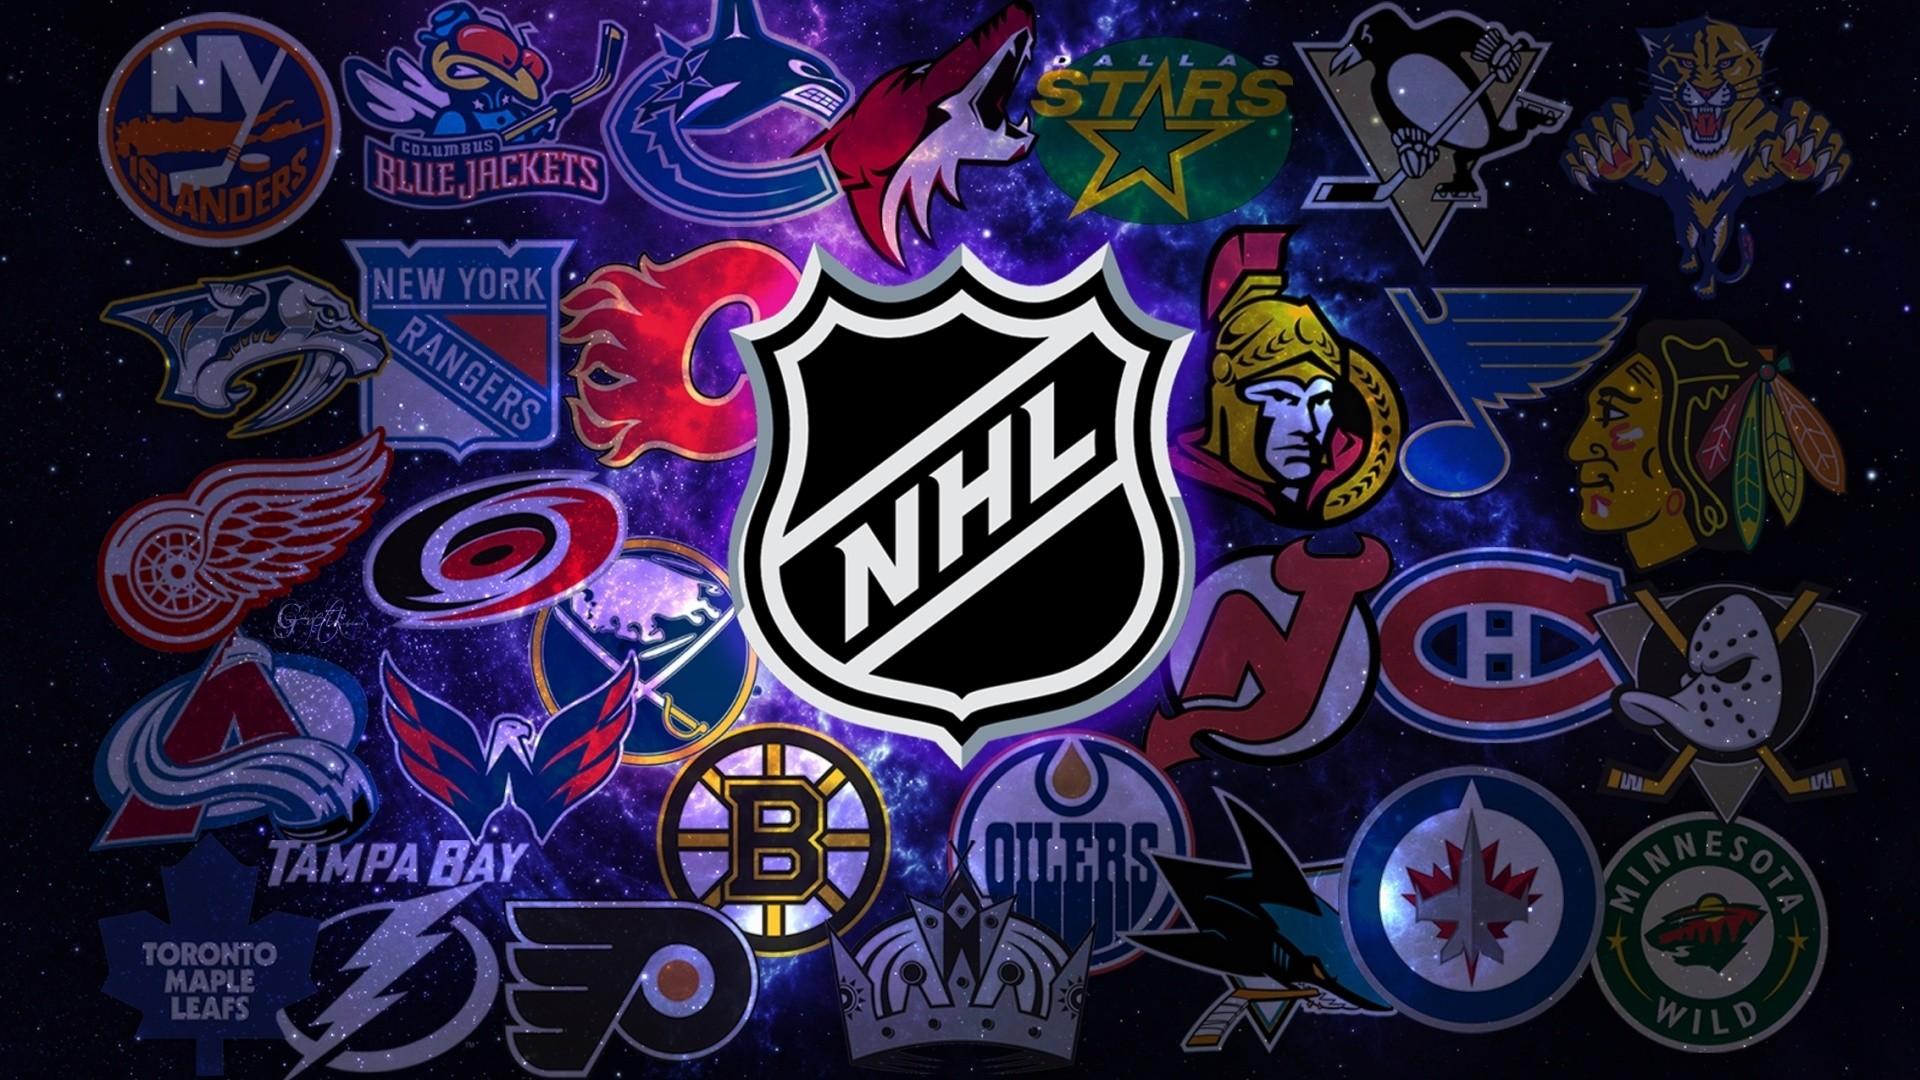 HD NHL TEAMS Wallpaper (2013) desktop PC and Mac wallpaper